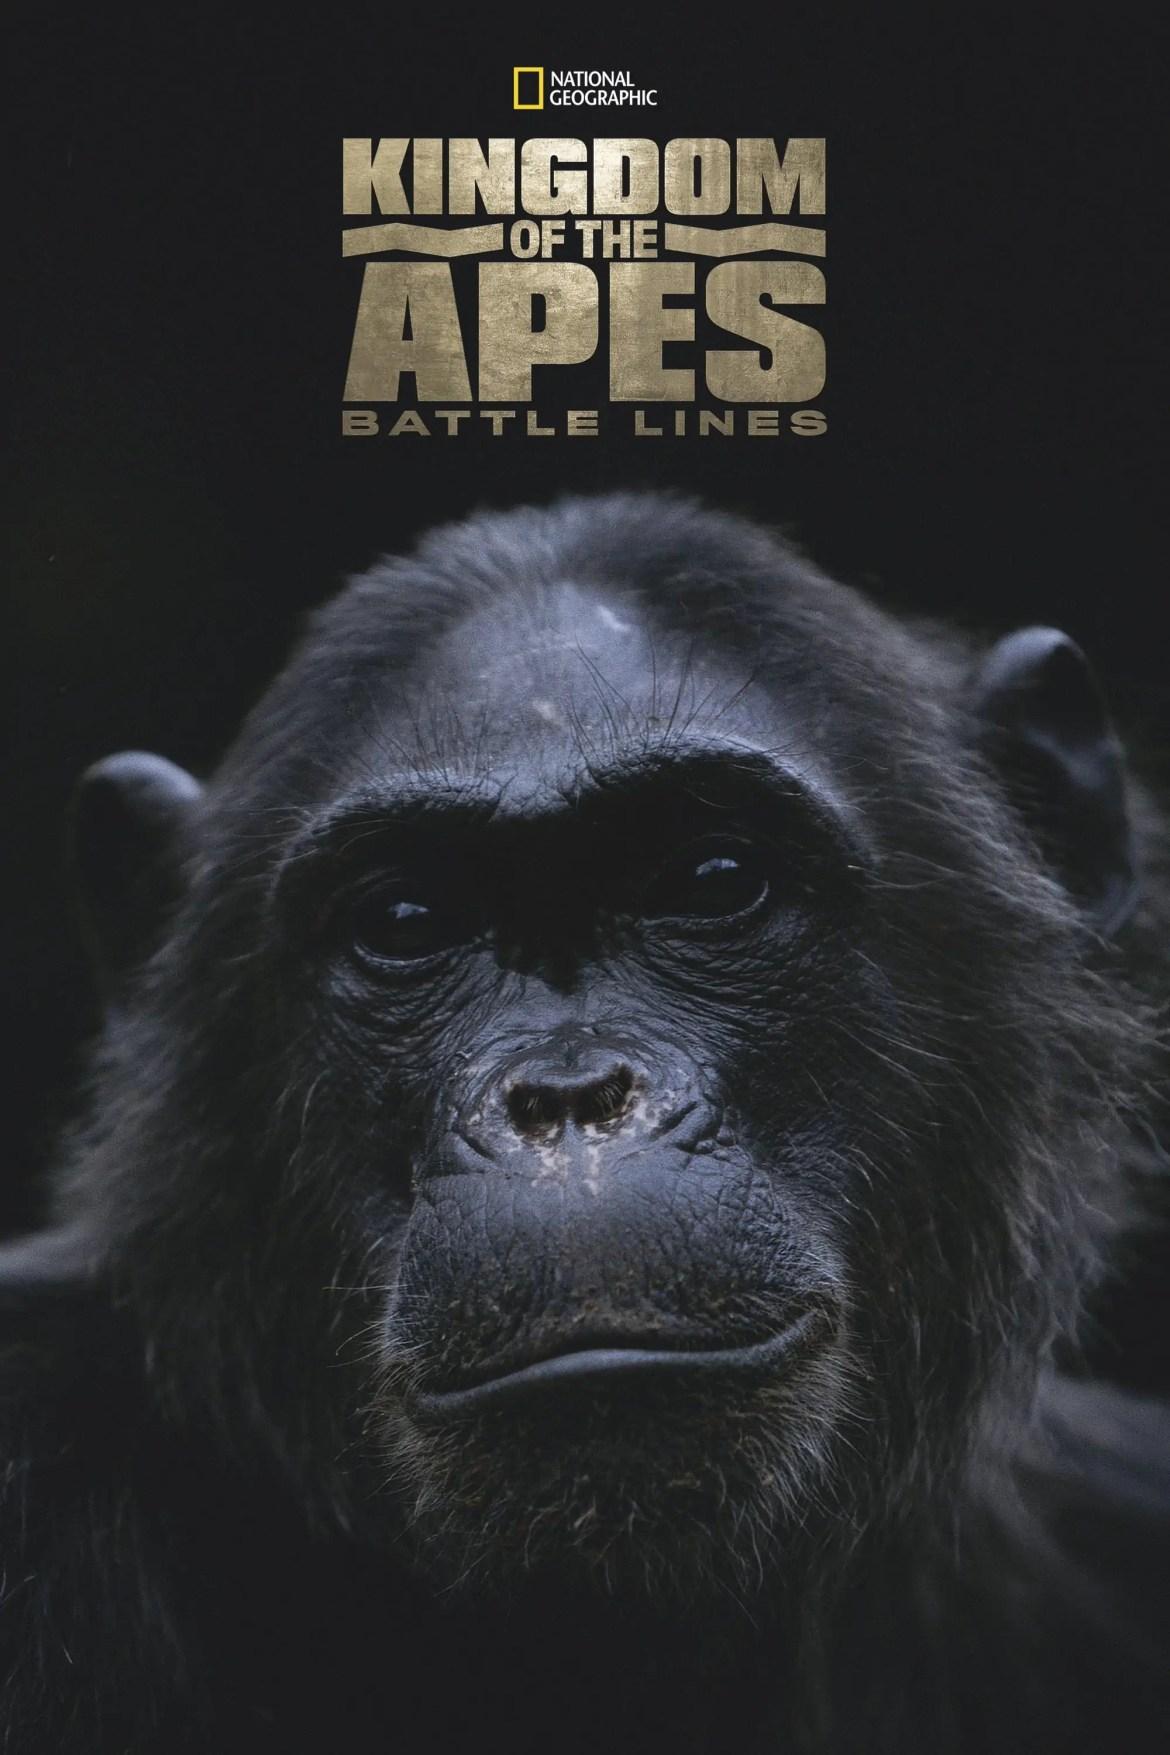 Disneyplus Kingdom of the apes